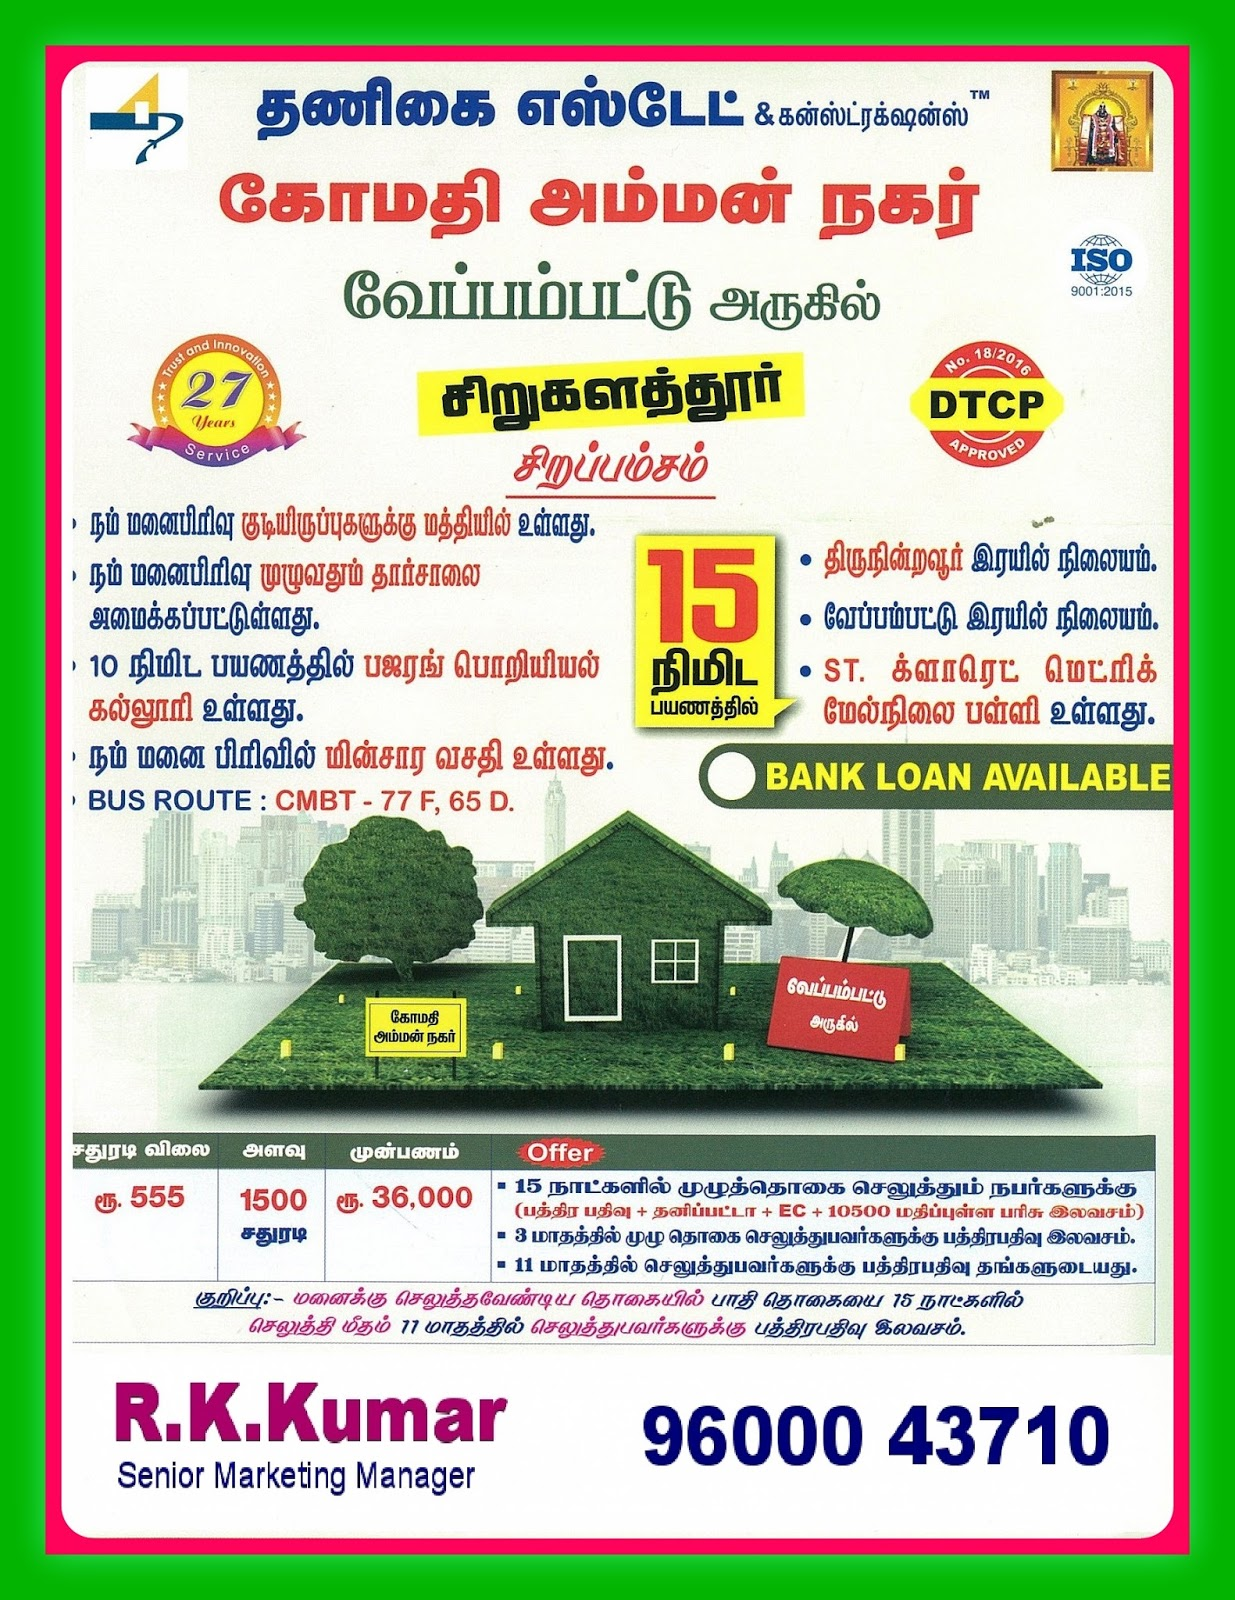 Veppampattu - DTCP Approved Plots